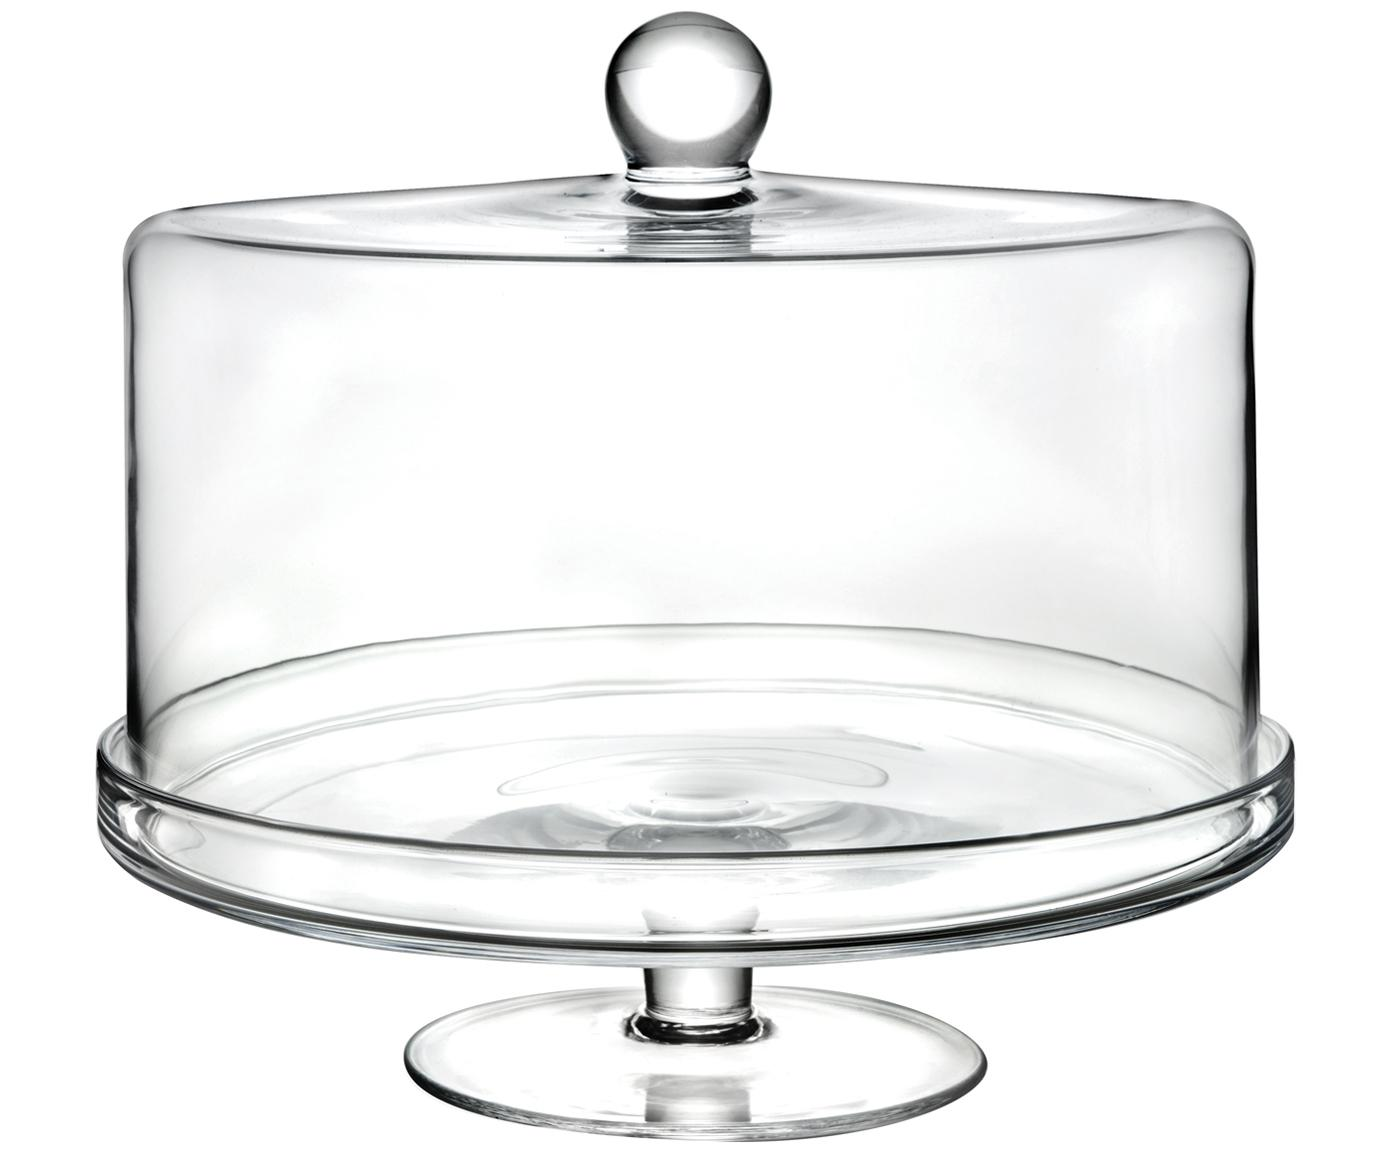 Kristall-Tortenplatte Maja, Luxion-Kristallglas, Transparent, Ø 30 x H 25 cm